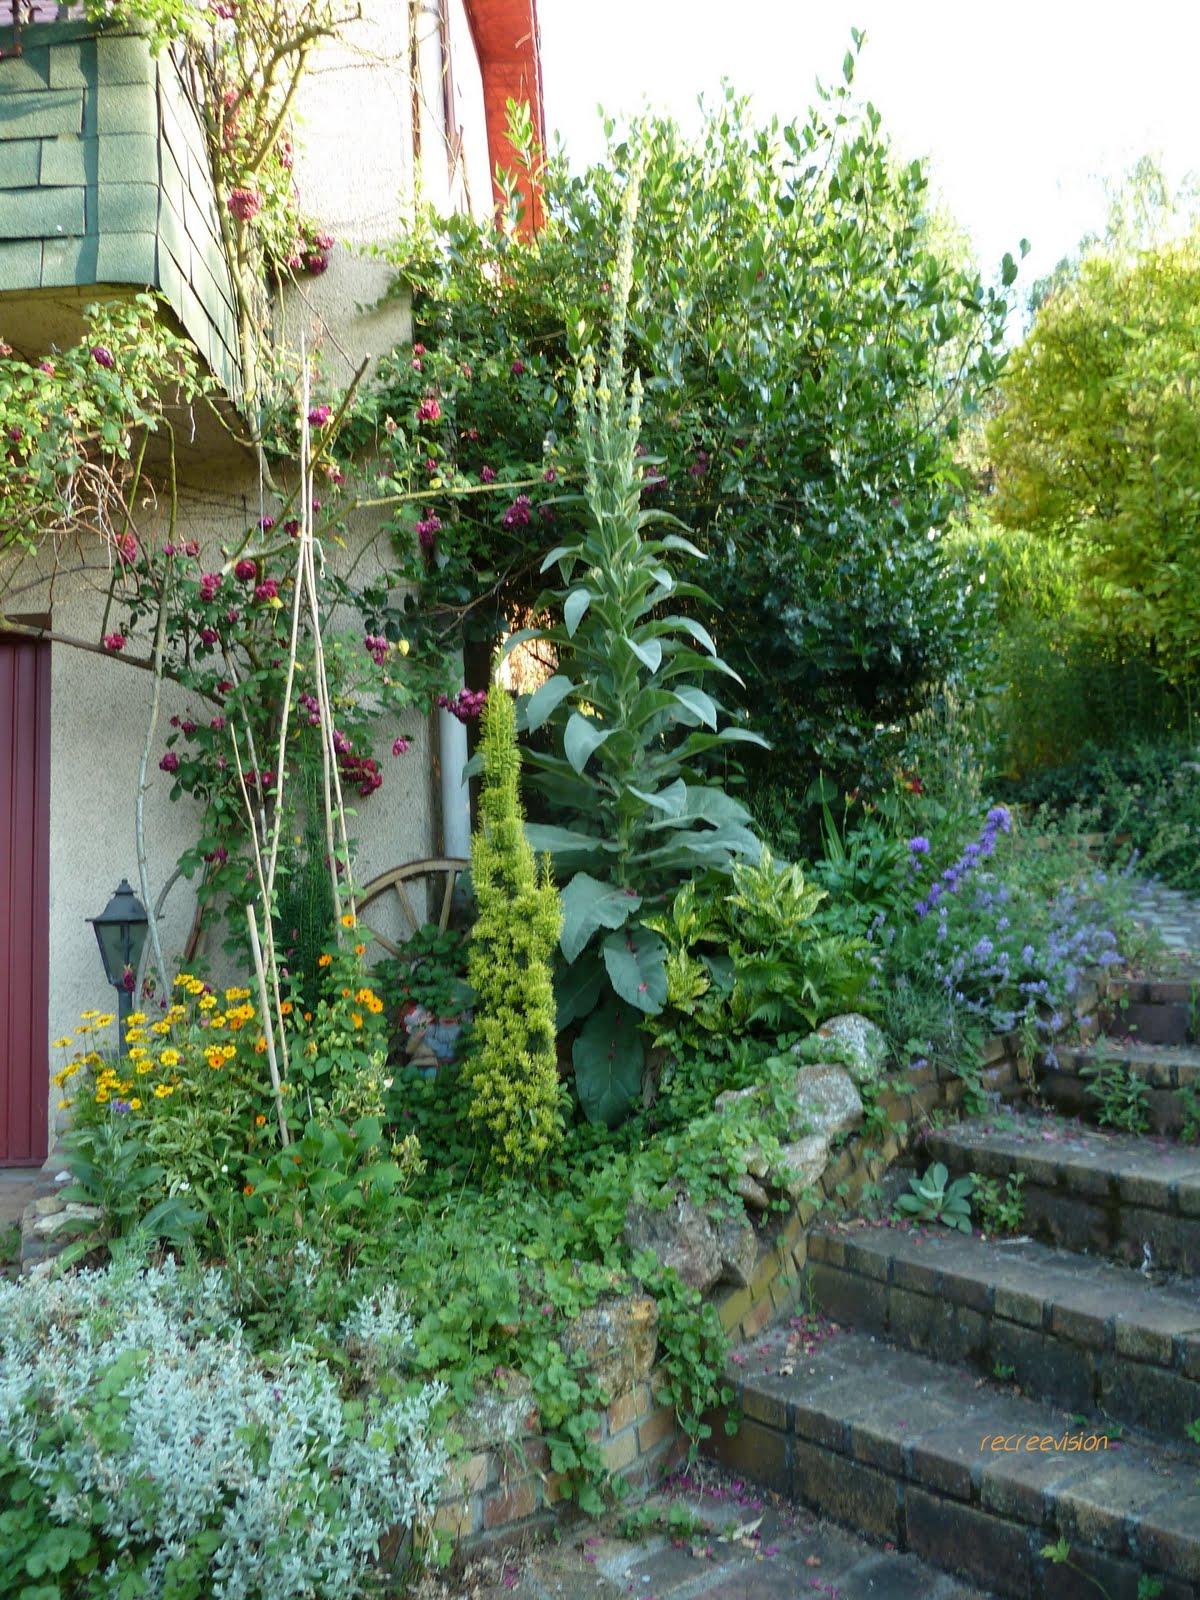 recreevision une plante s 39 est invit e au jardin ForPlante Au Jardin